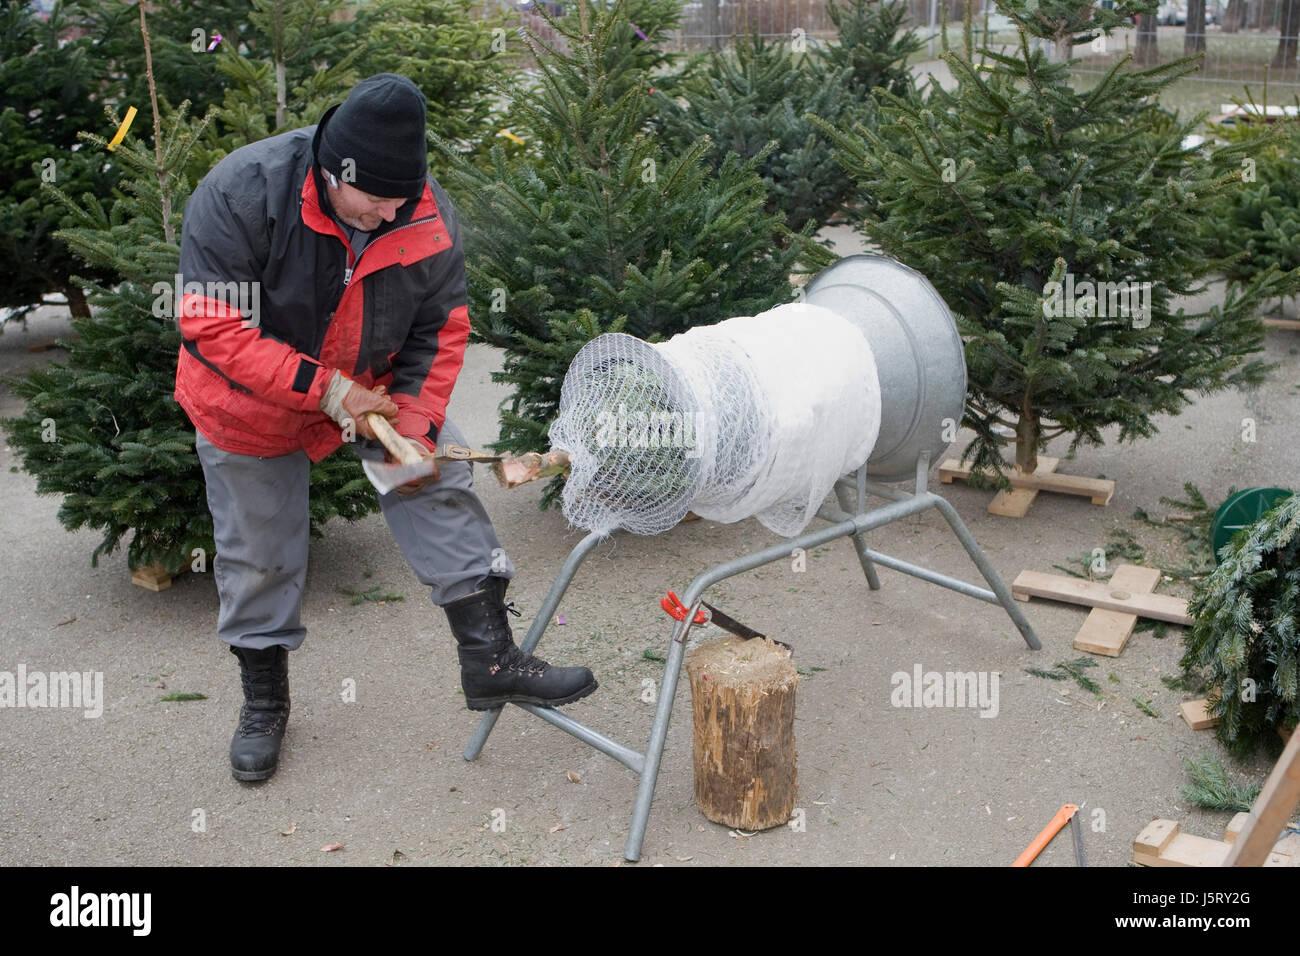 party celebration conifer sale christmas tree christmas yule kiosk finely woven Stock Photo